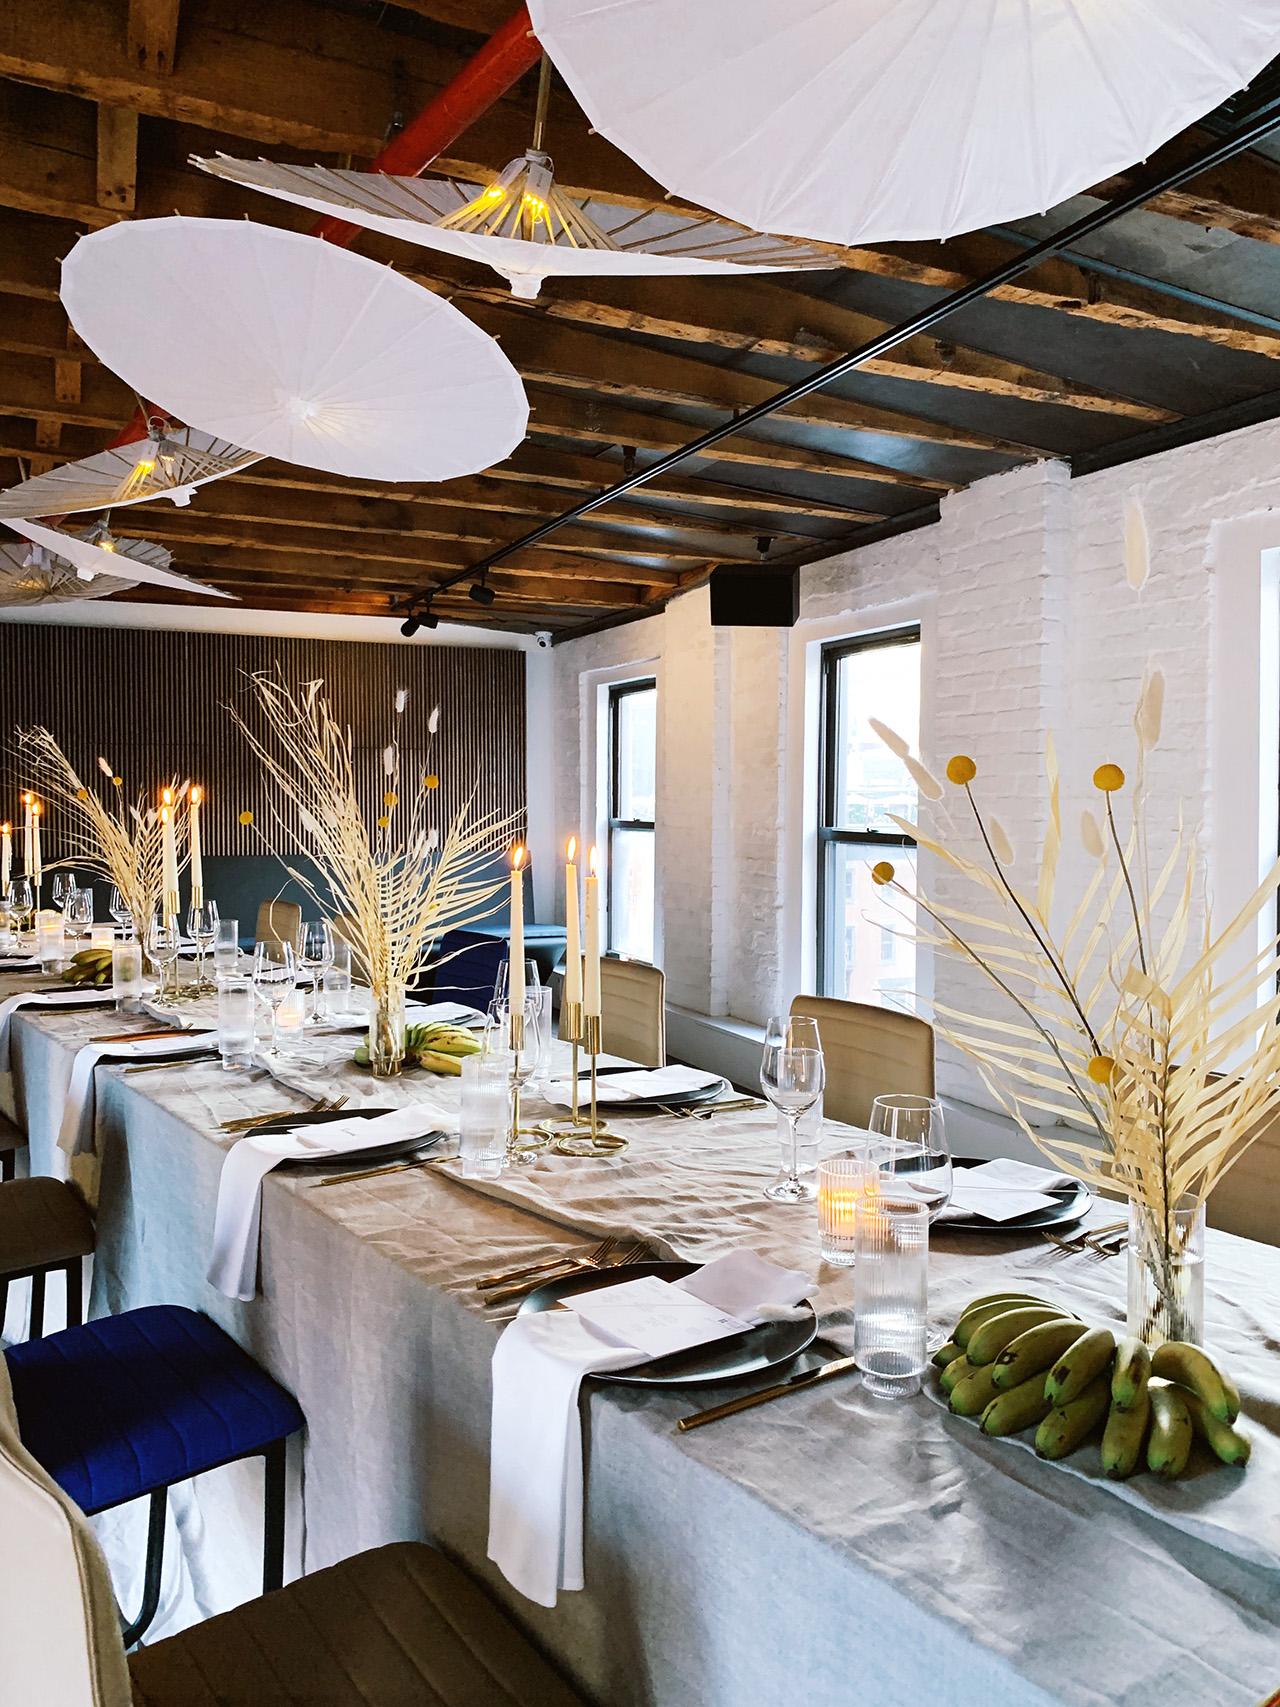 pen-plan penthouse loft wedding venue table setting